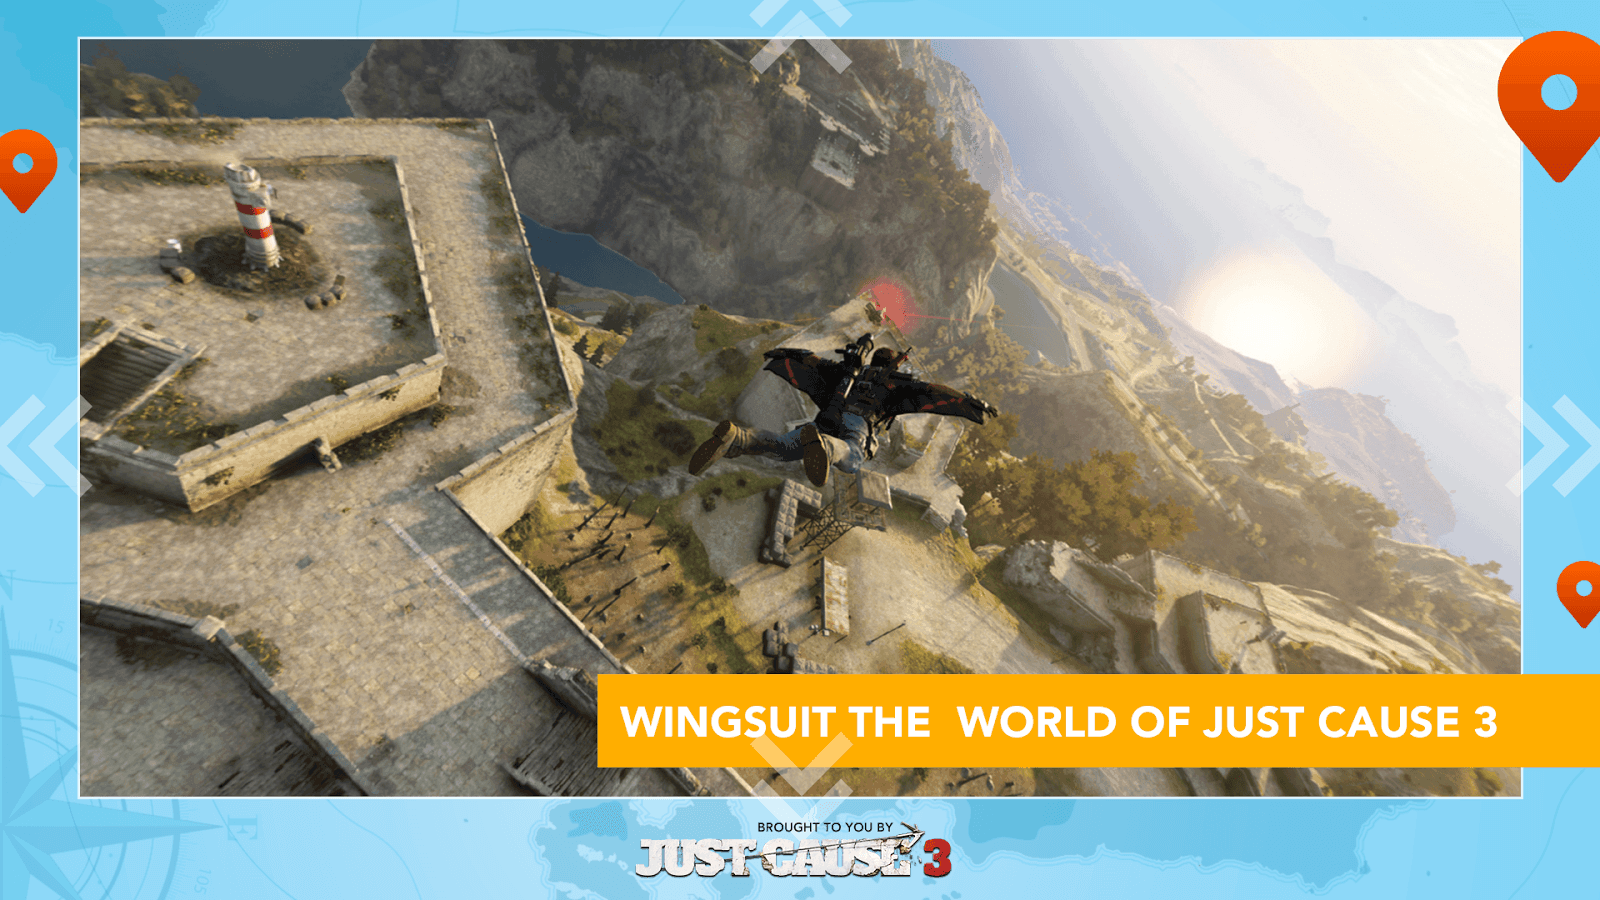 Just Cause 3 WingSuit Tour